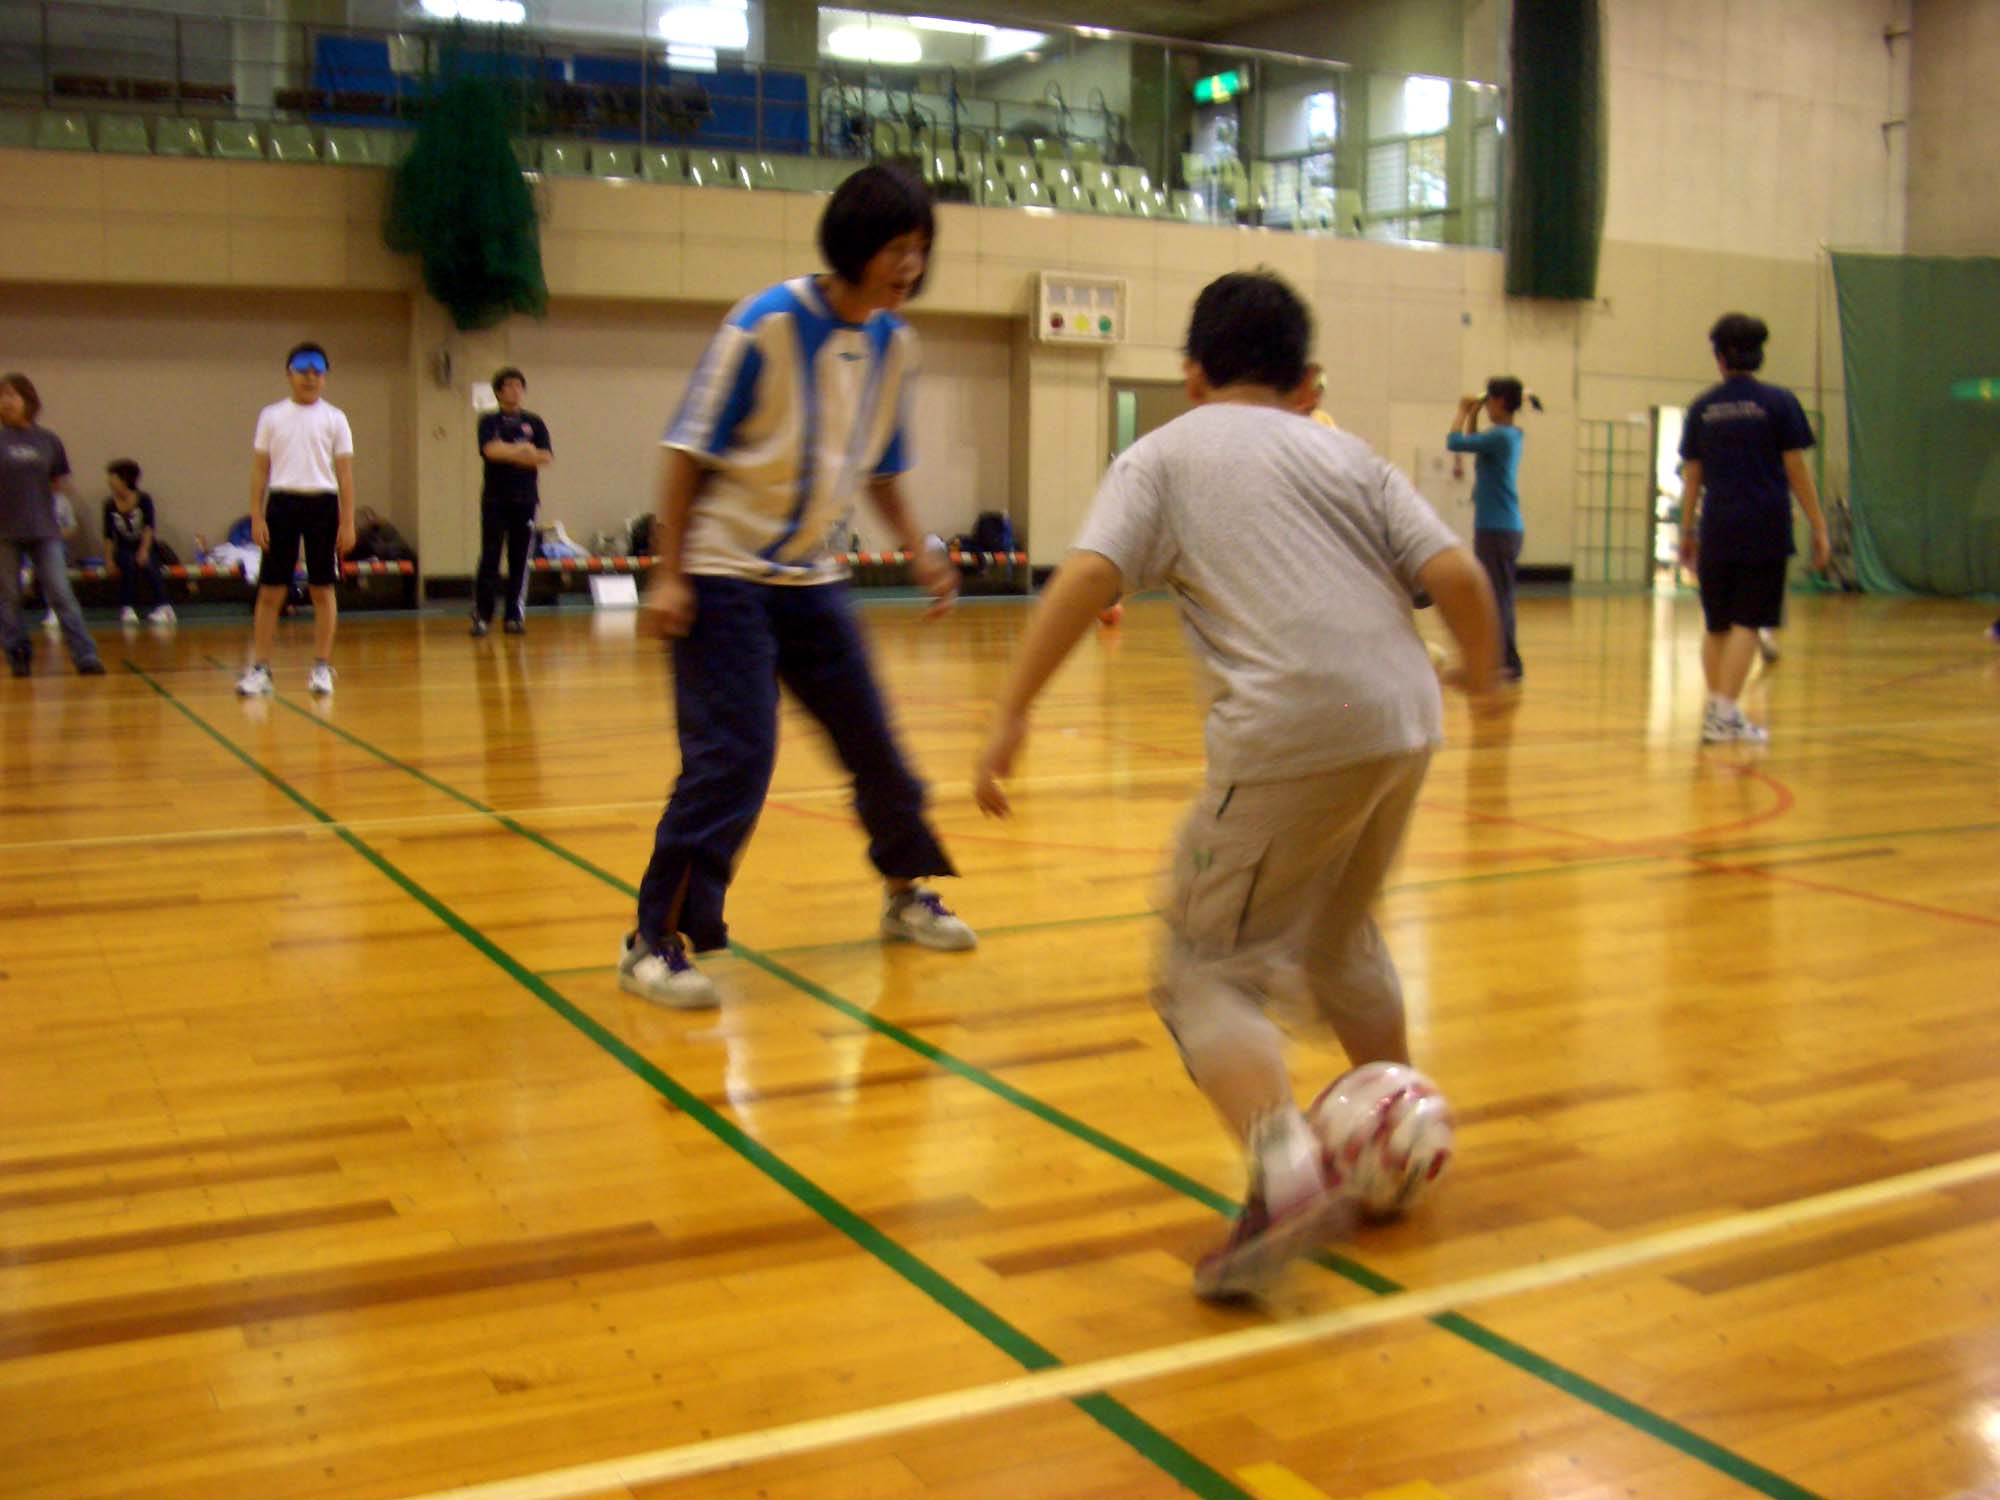 CIMG5457 - 障害者スポーツ体験教室より ・・・ブラインドサッカー、巧みなステップでディフェンスをかわす!